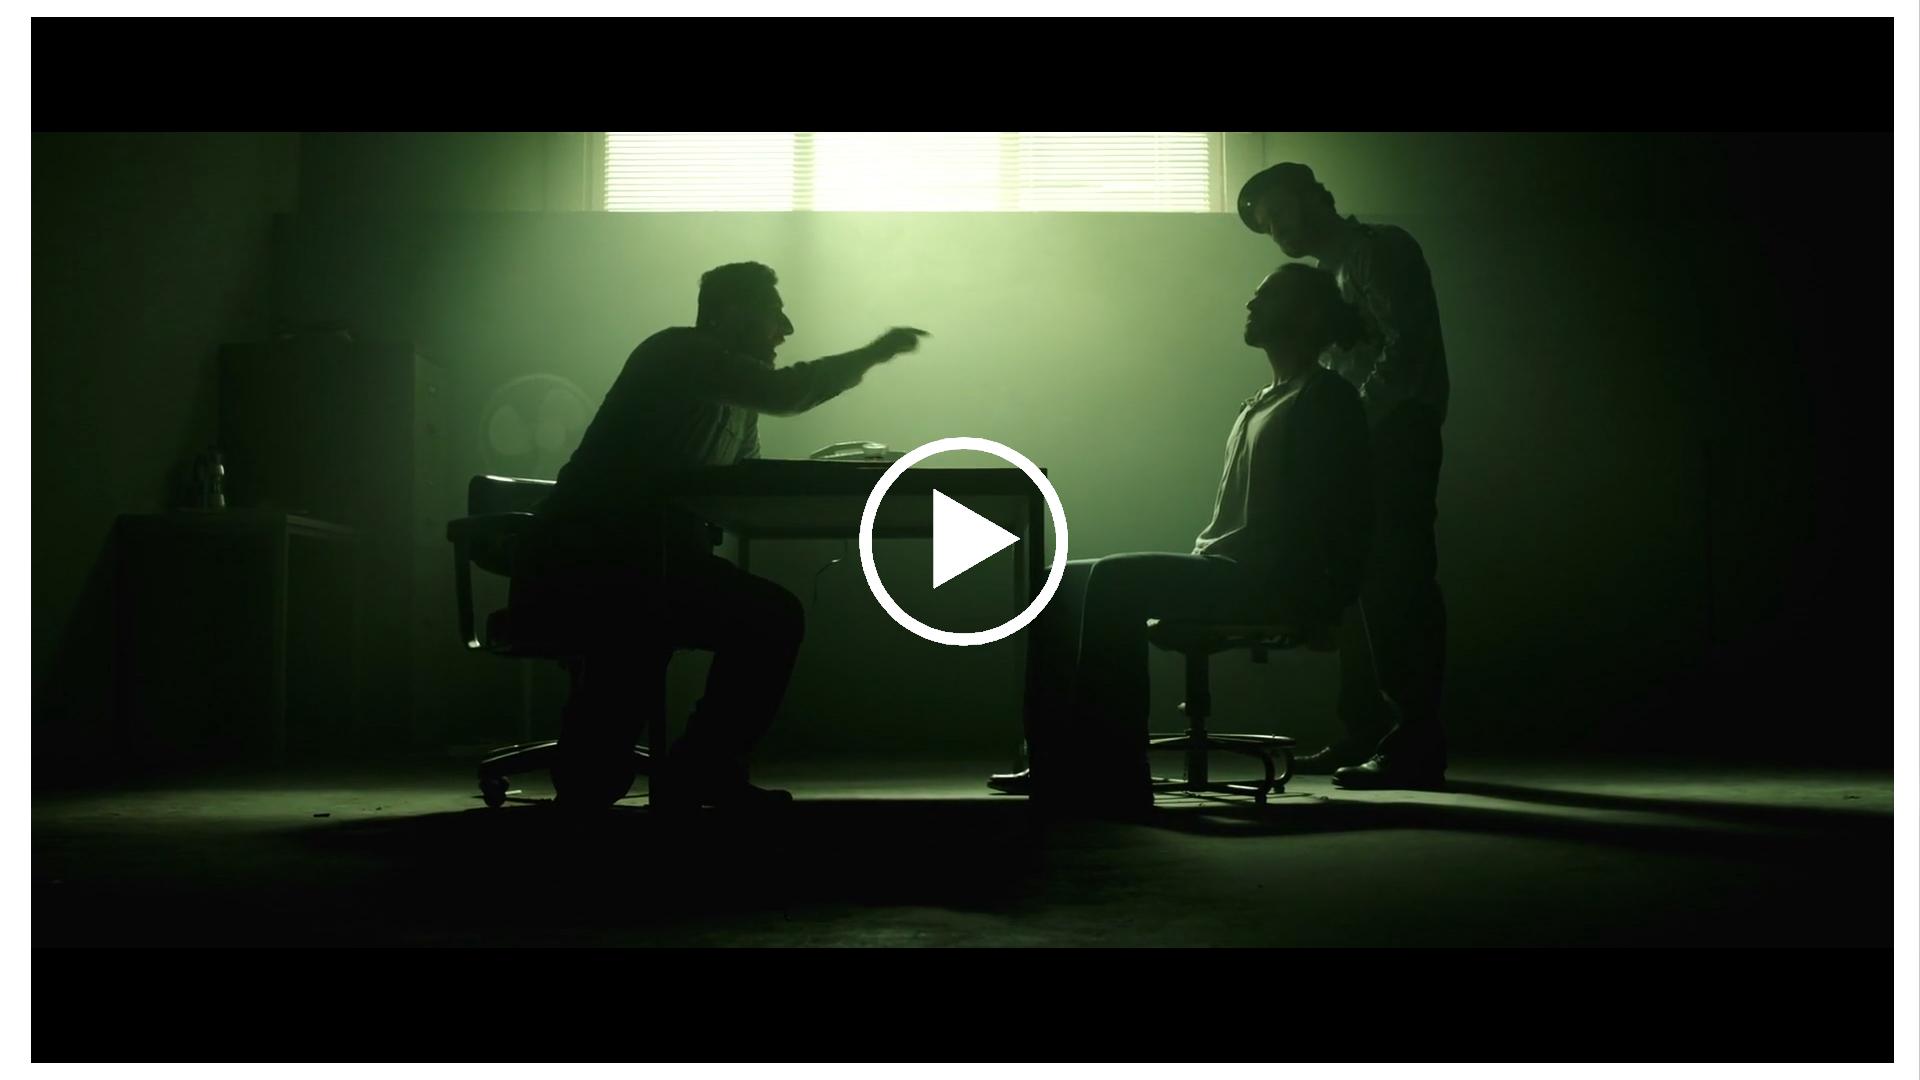 film-storytelling-amnesty-international-the culprit